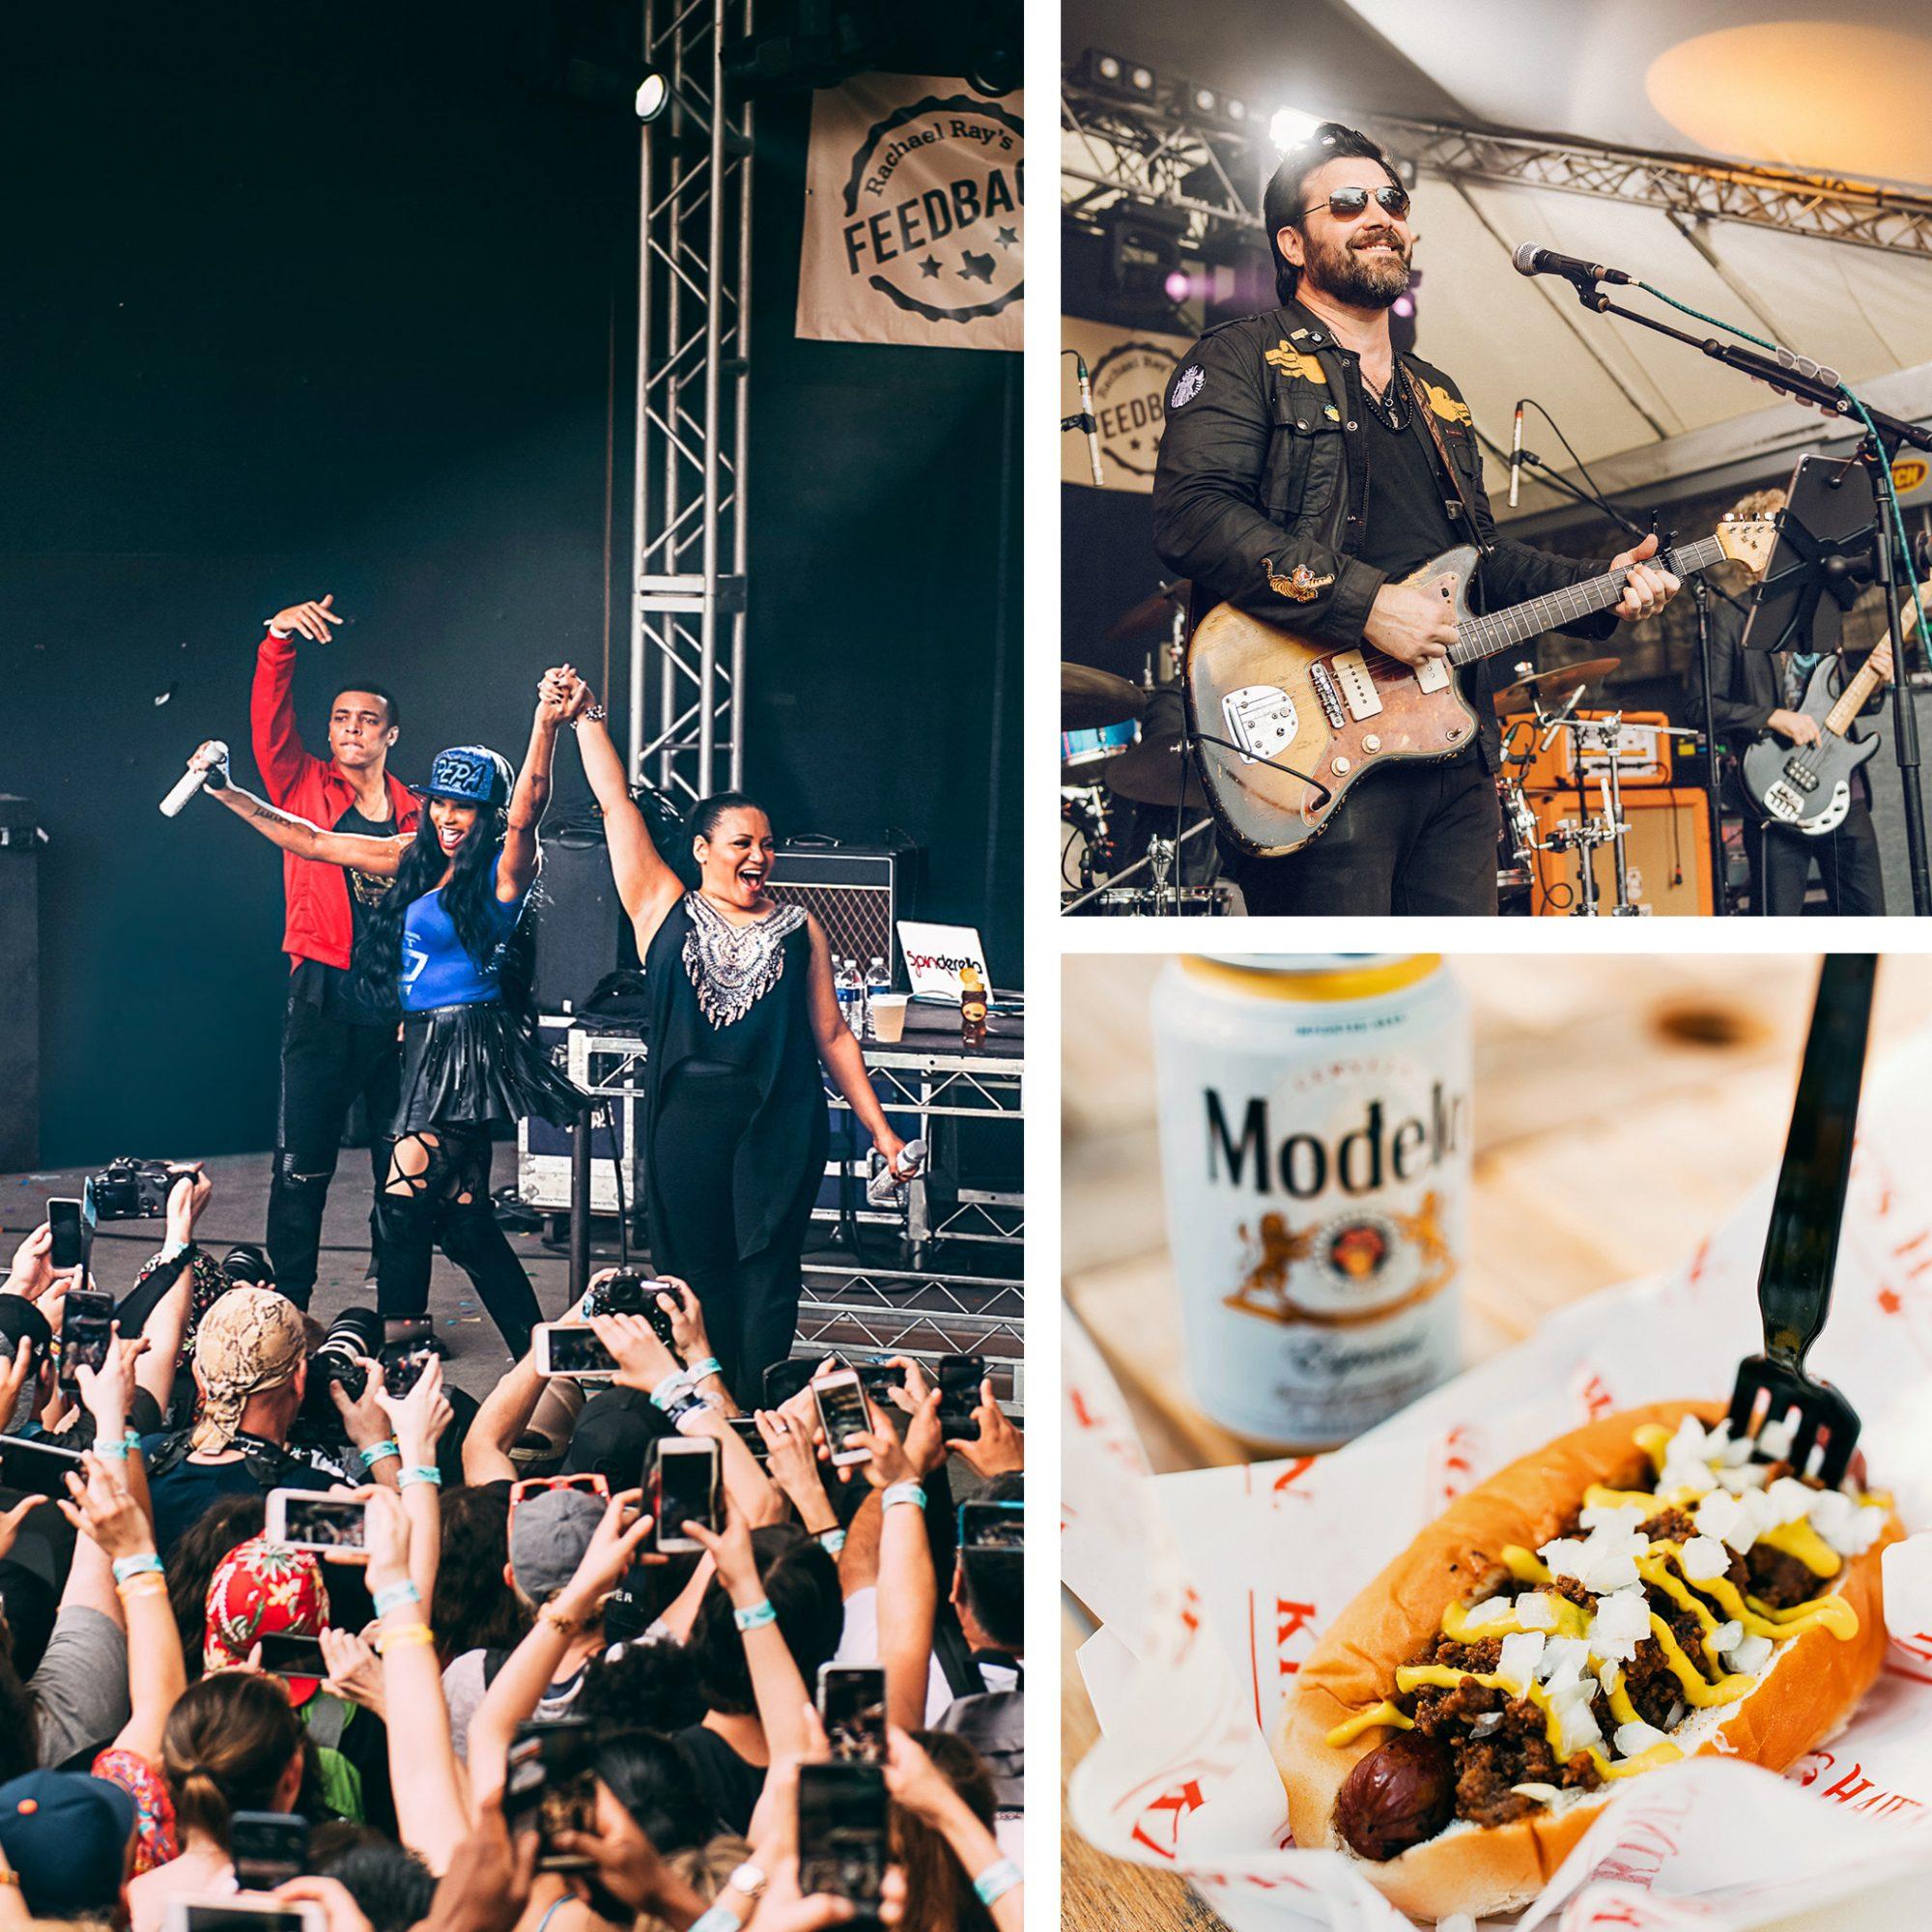 festival-hotdog-music